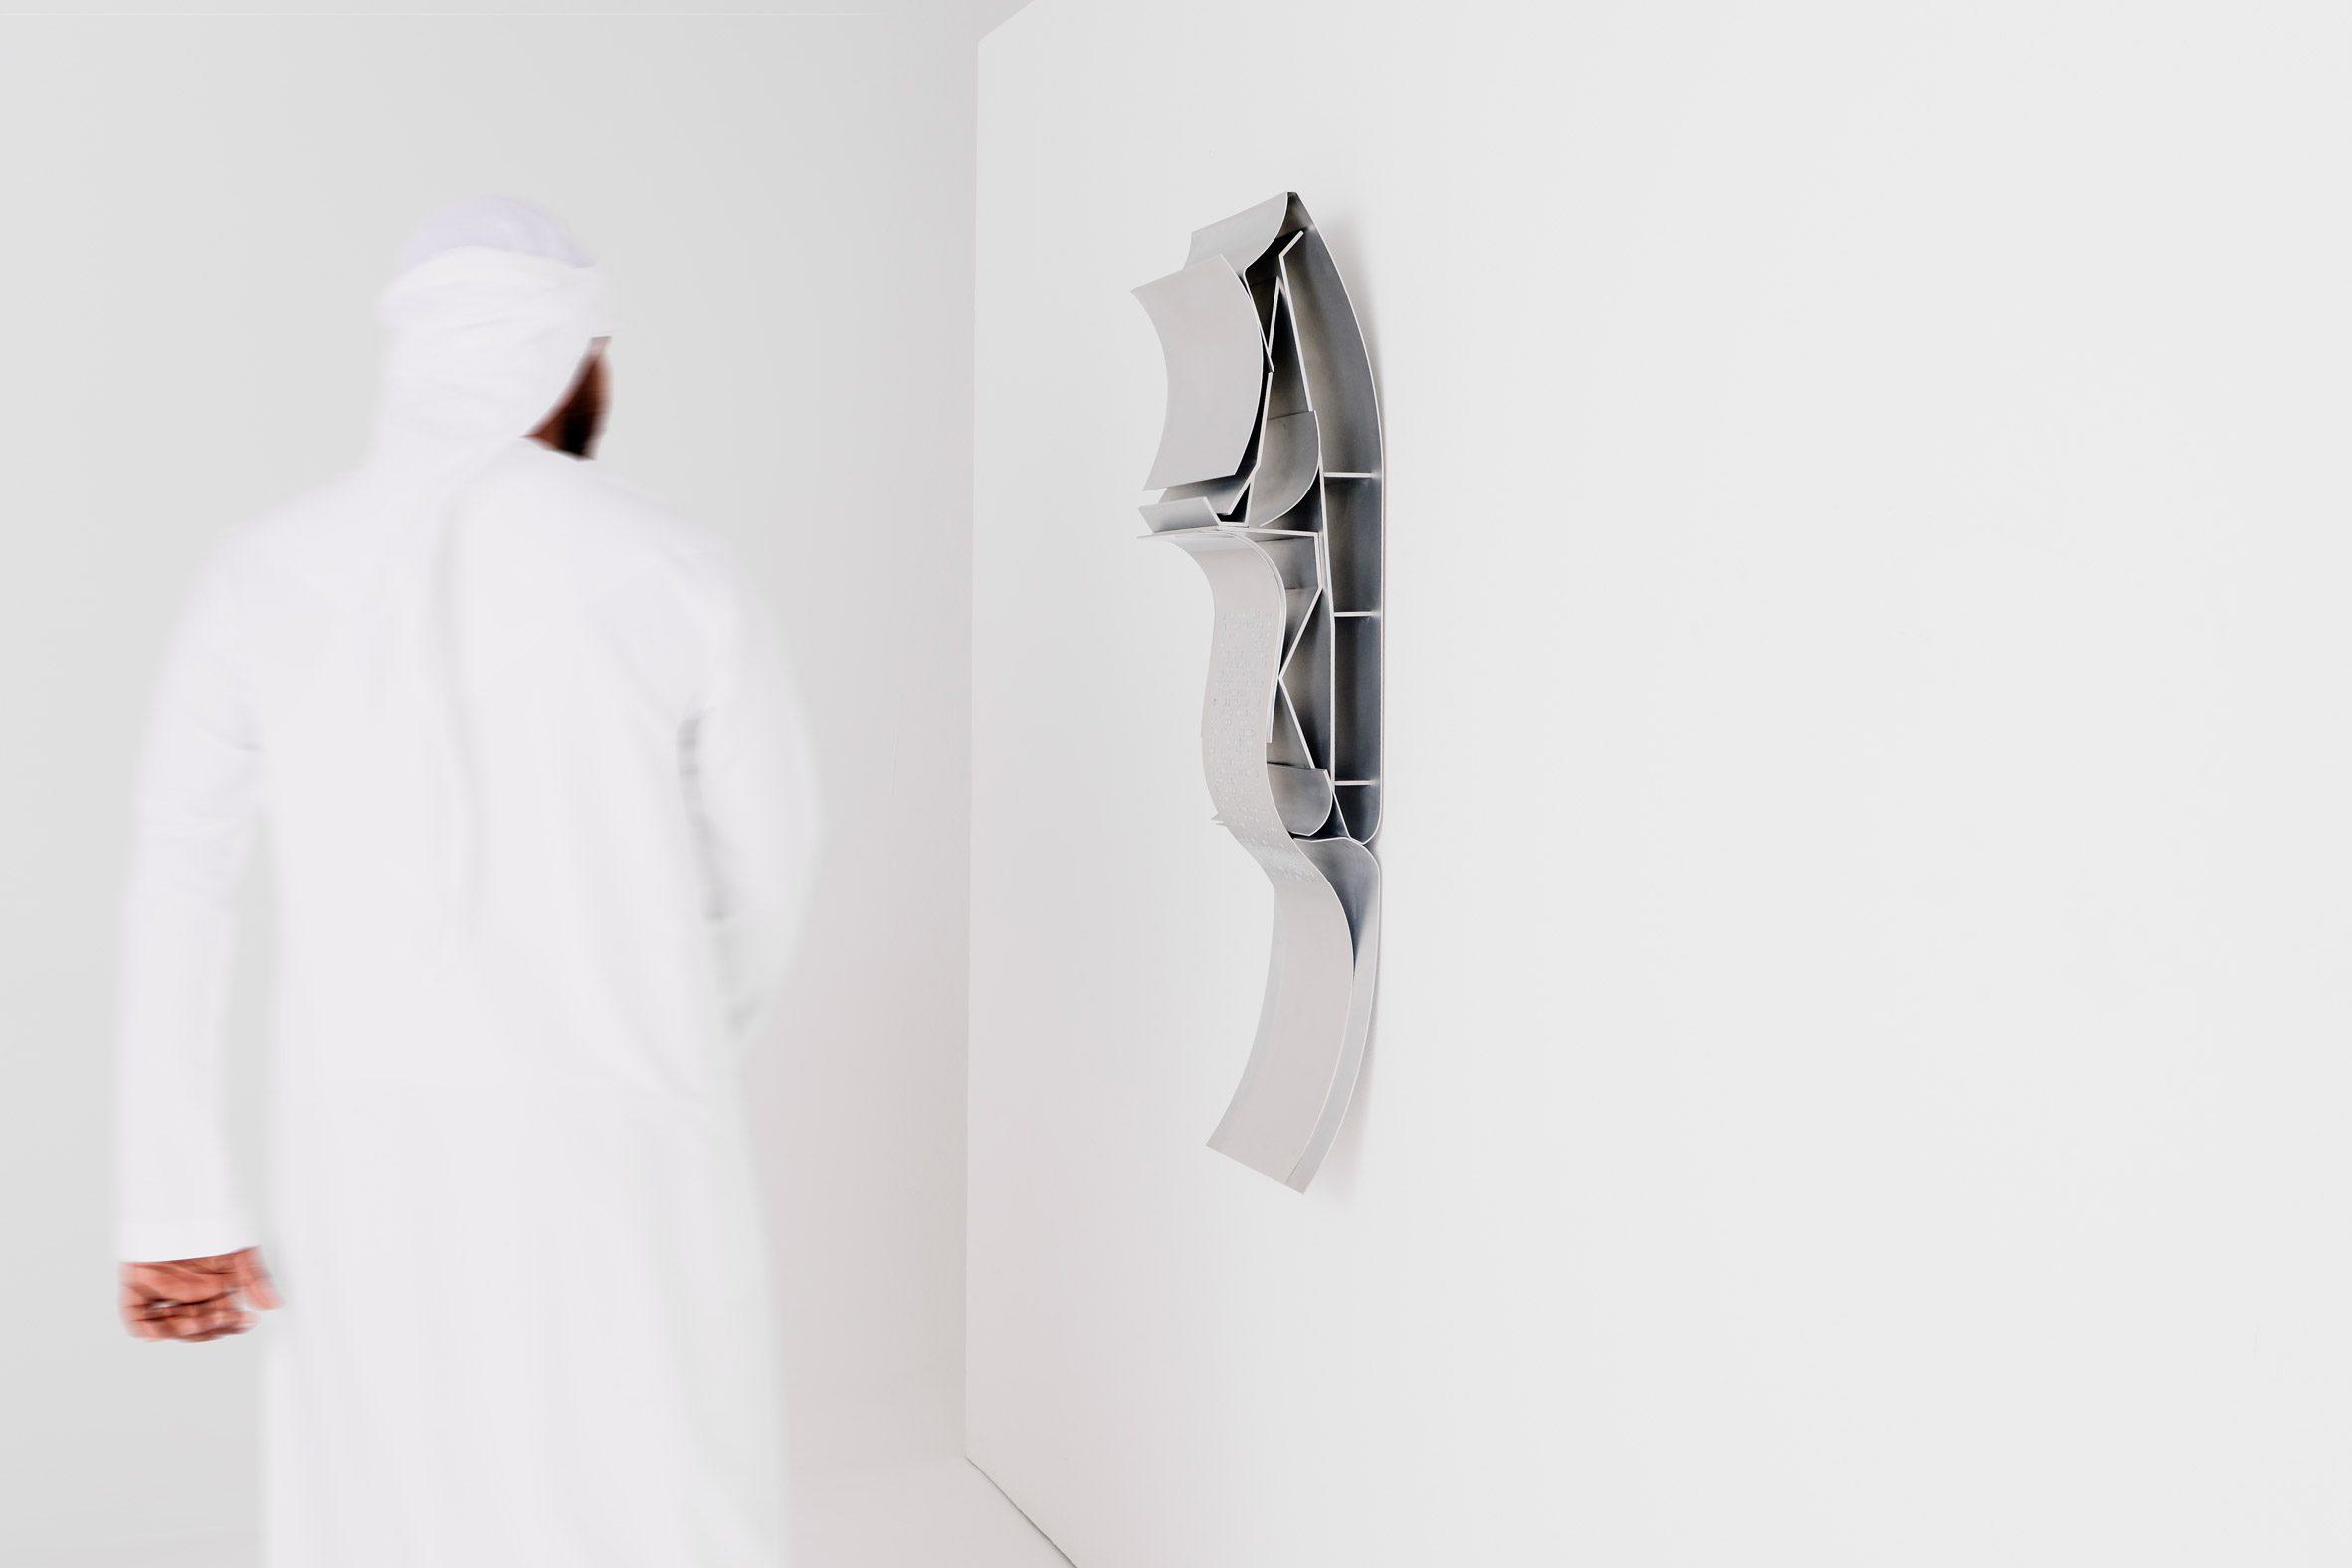 A photograph of a sculpture by a Dubai-based designer